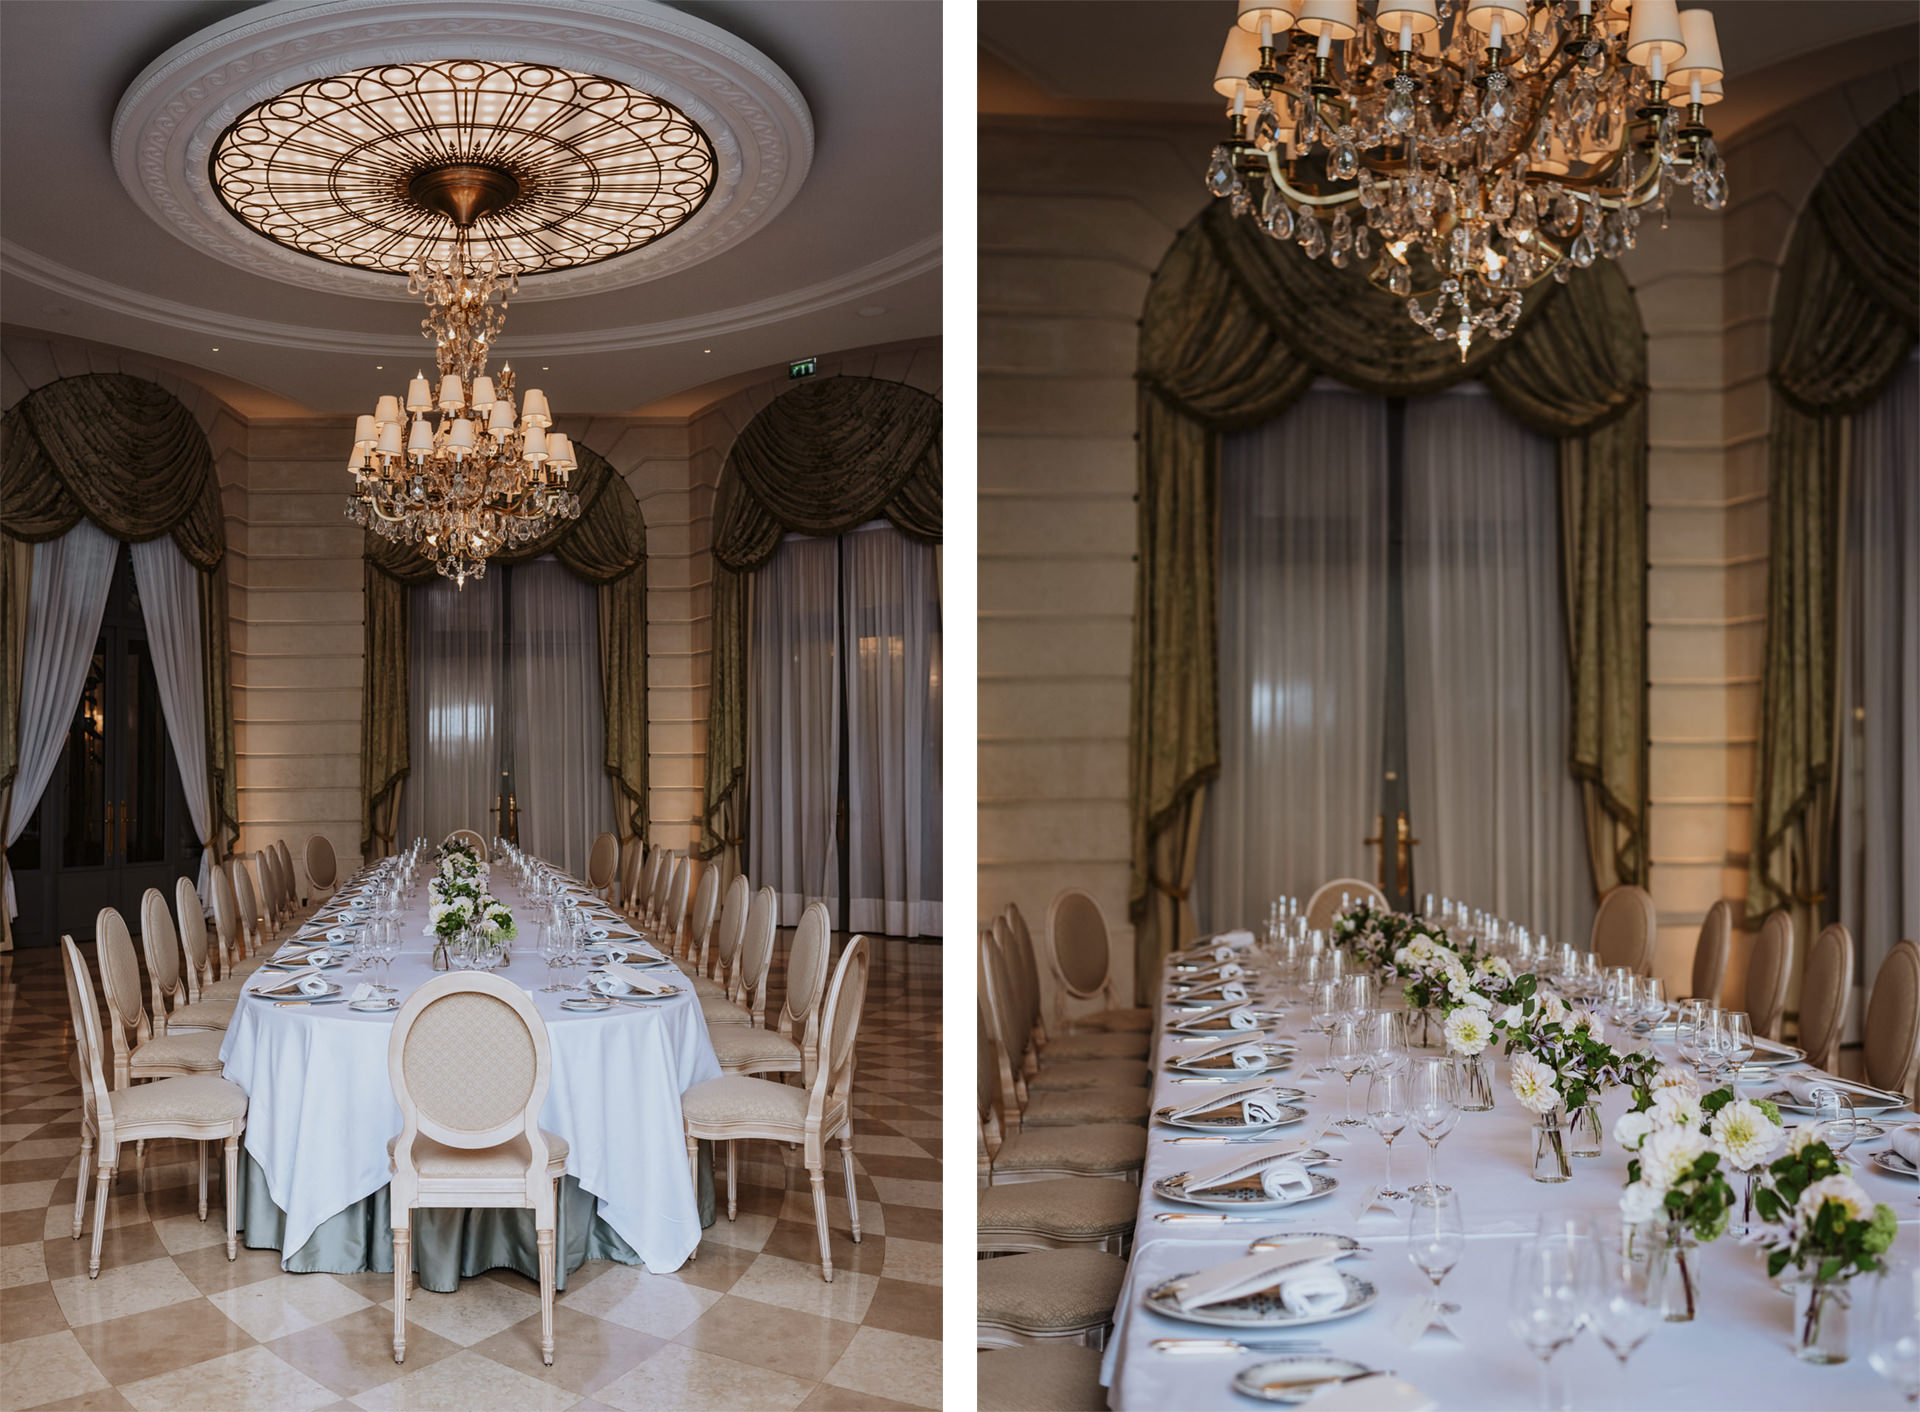 Hotel Ritz Paris wedding